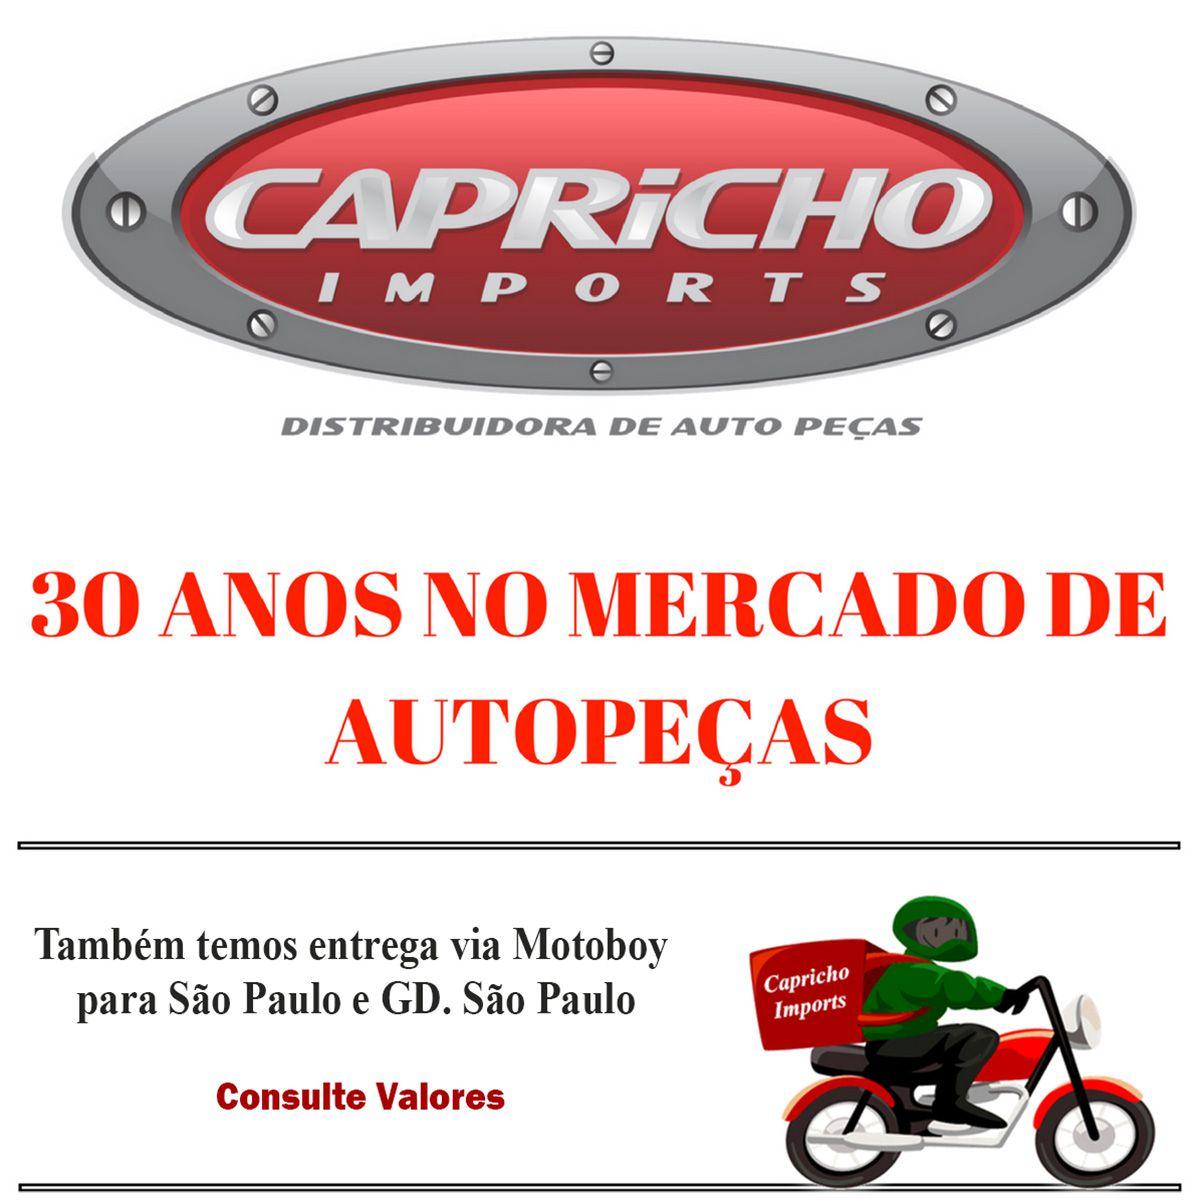 CONEXÃO DO RADIADOR AUDI 80 A4 A6 GOLF JETTA PASSAT 028121132a